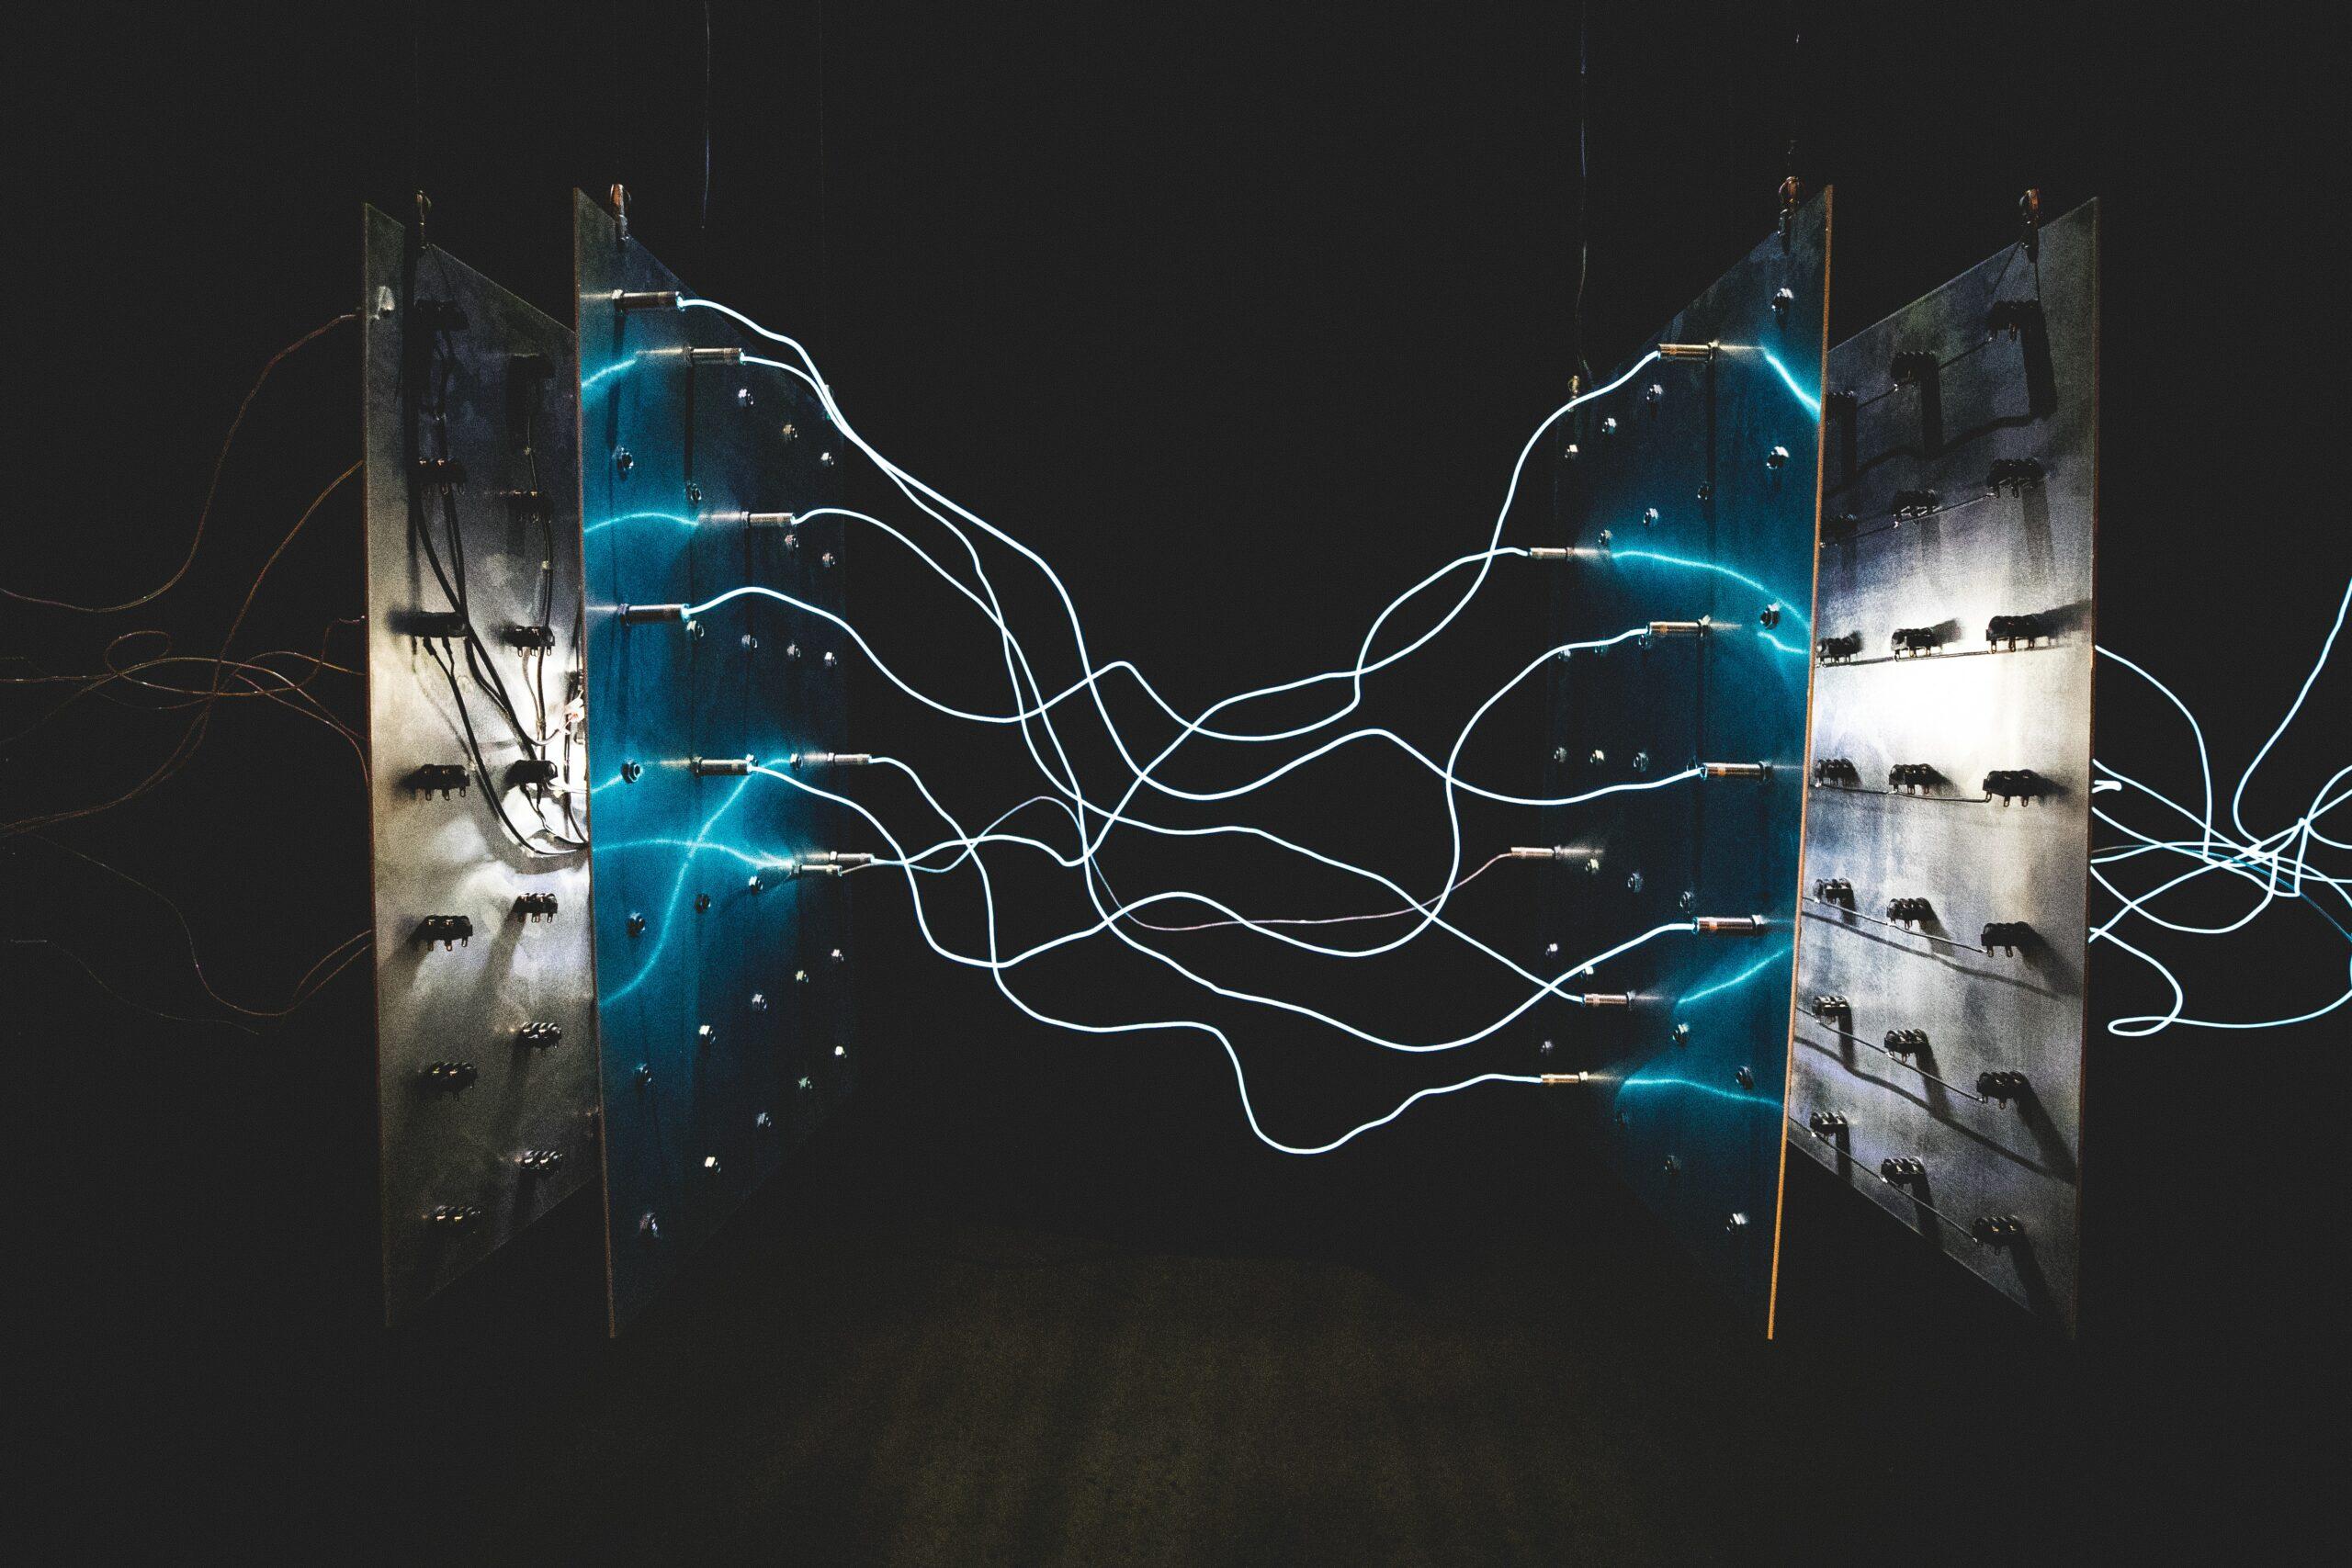 Elektrisitet strømmer mellom to metallplater